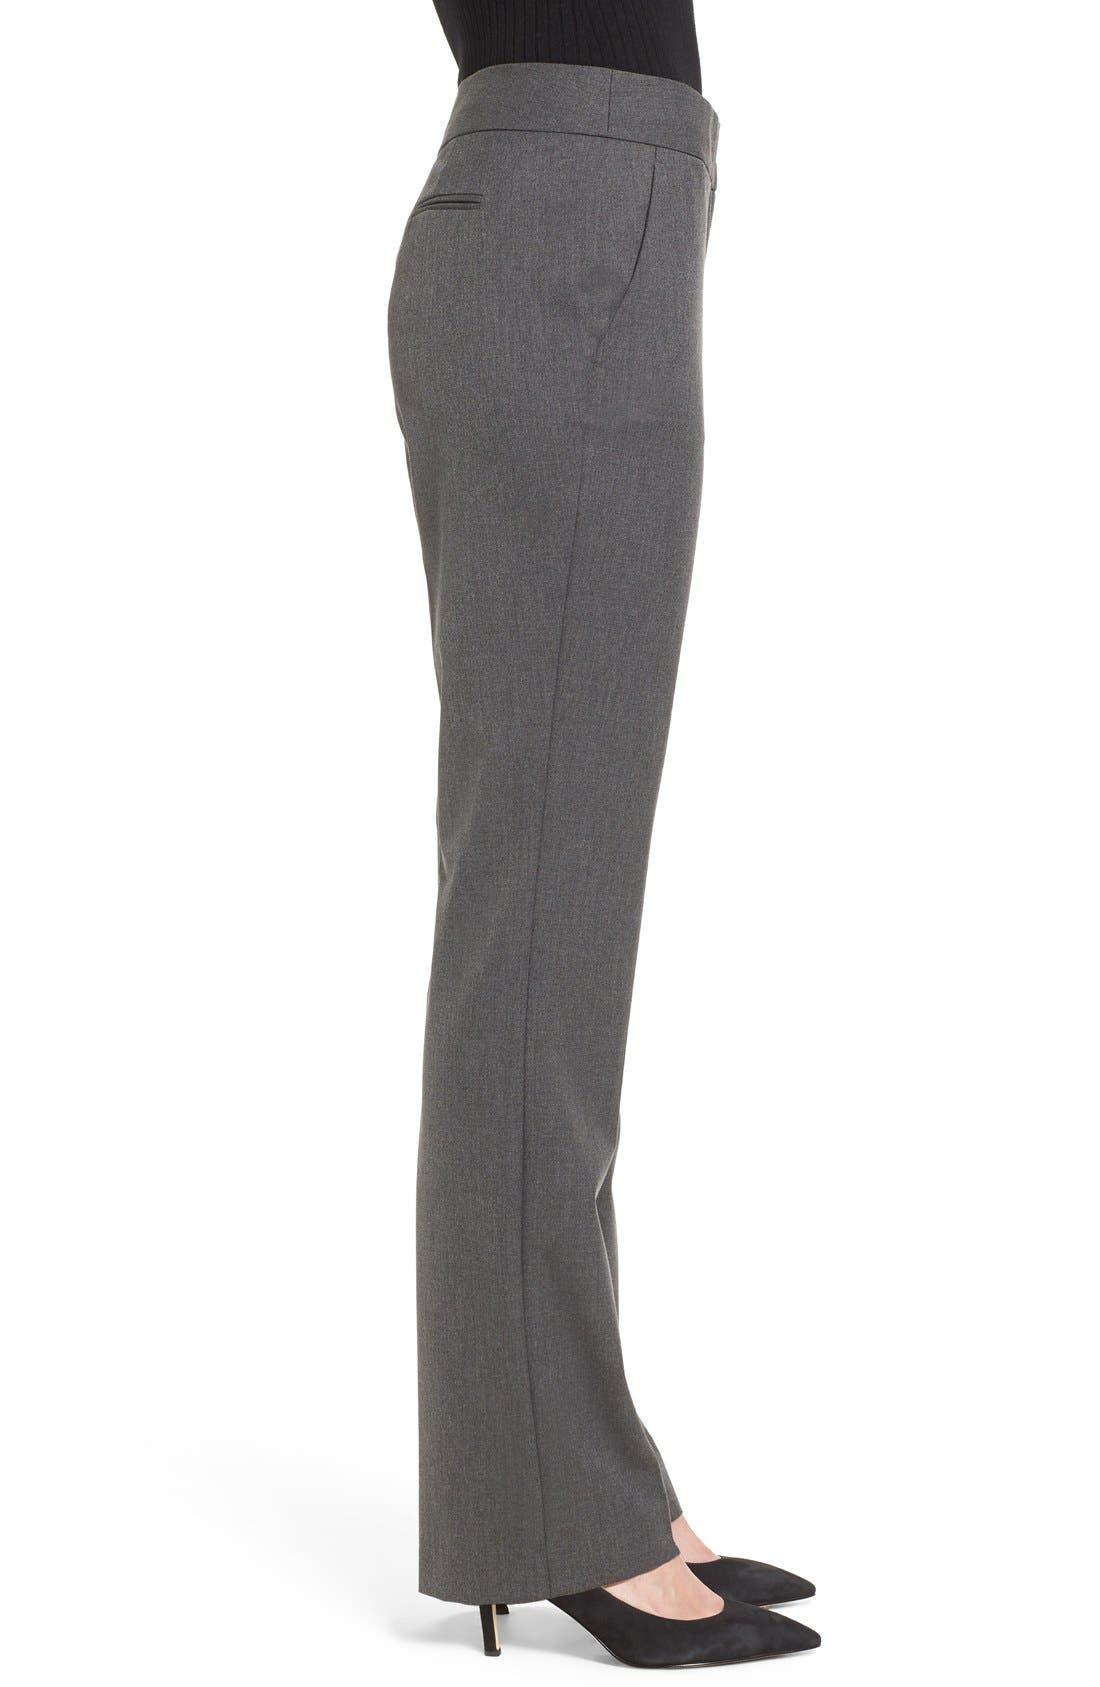 Alternate Image 3  - Vince Camuto Straight Leg Pants (Regular & Petite)